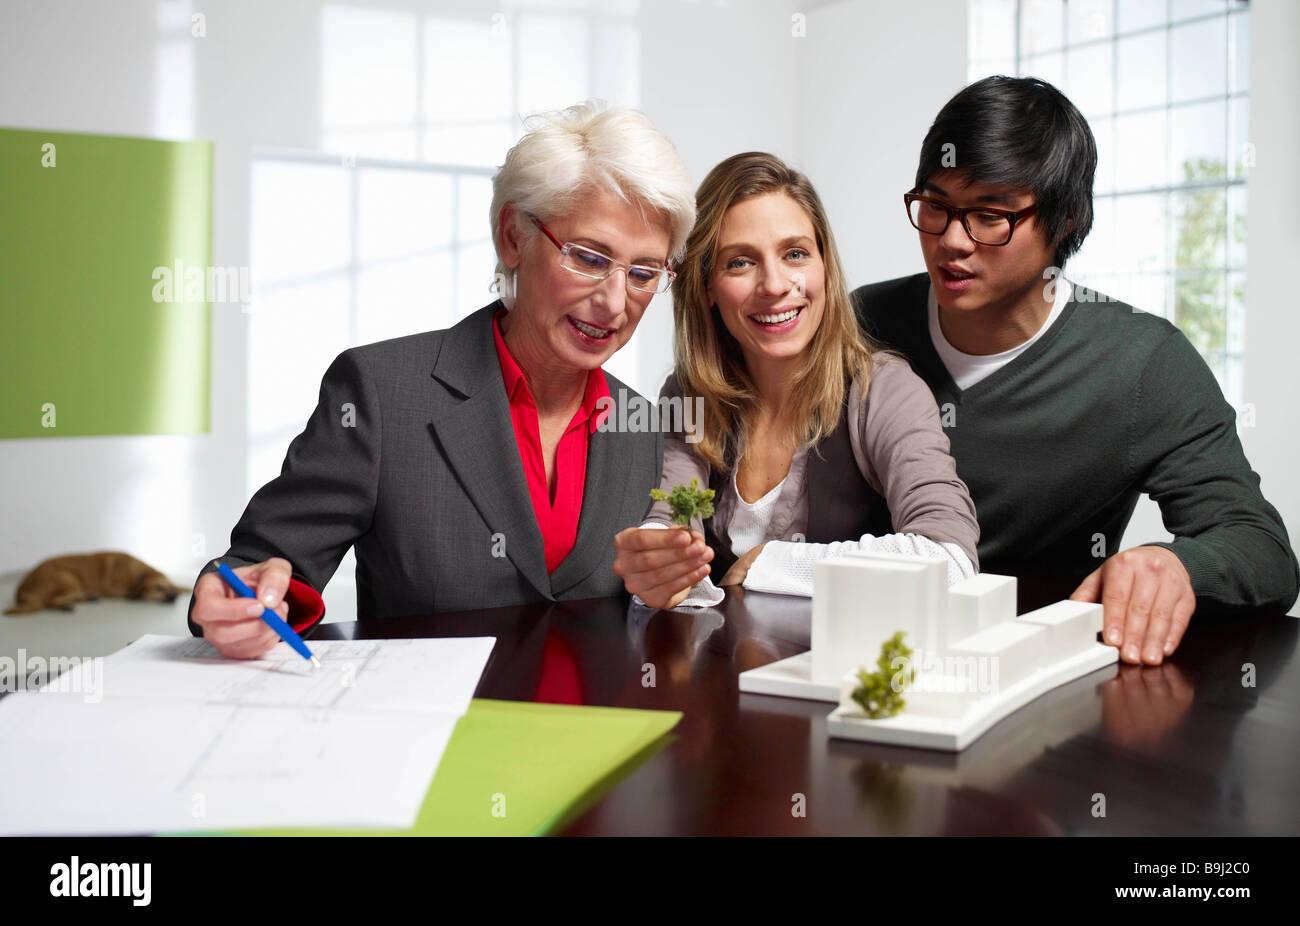 Team of international architects working - Stock Image